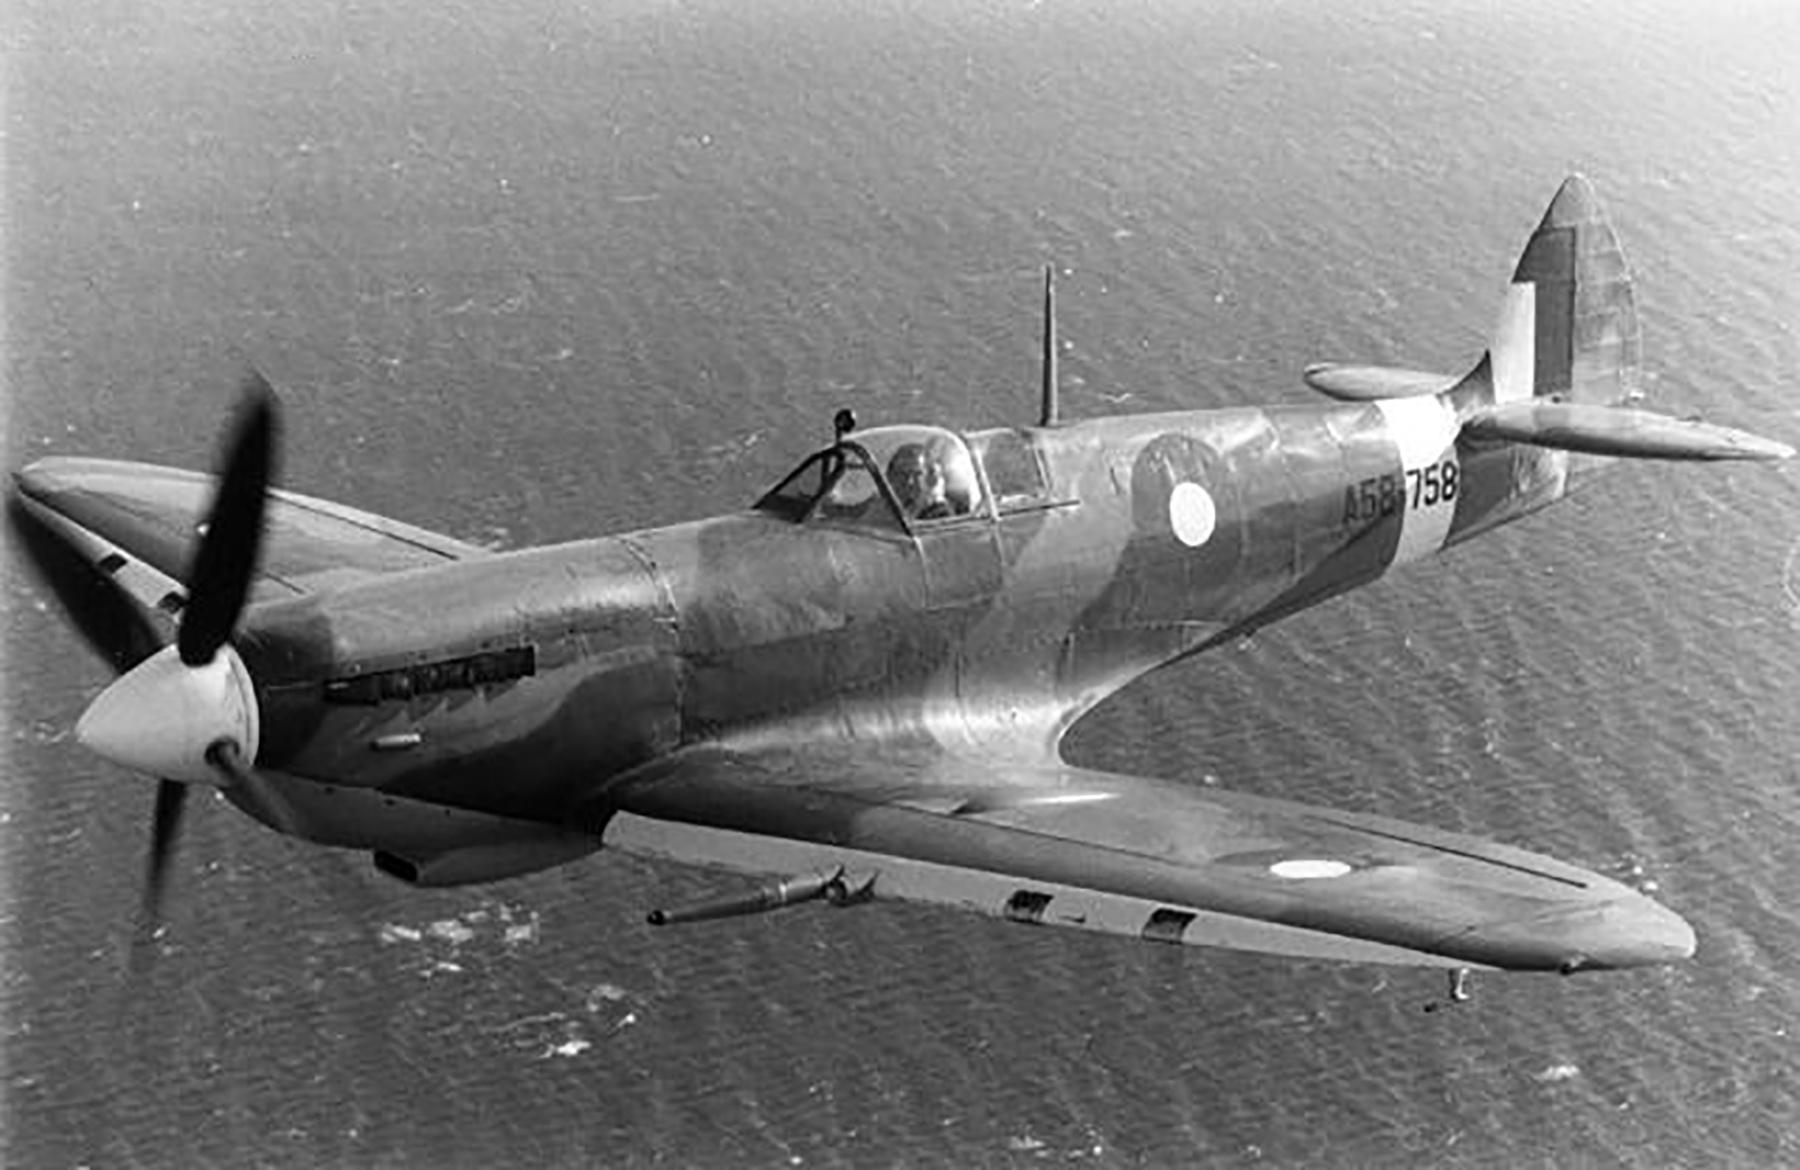 Spitfire RAAF A58 758 Australia 1945 01